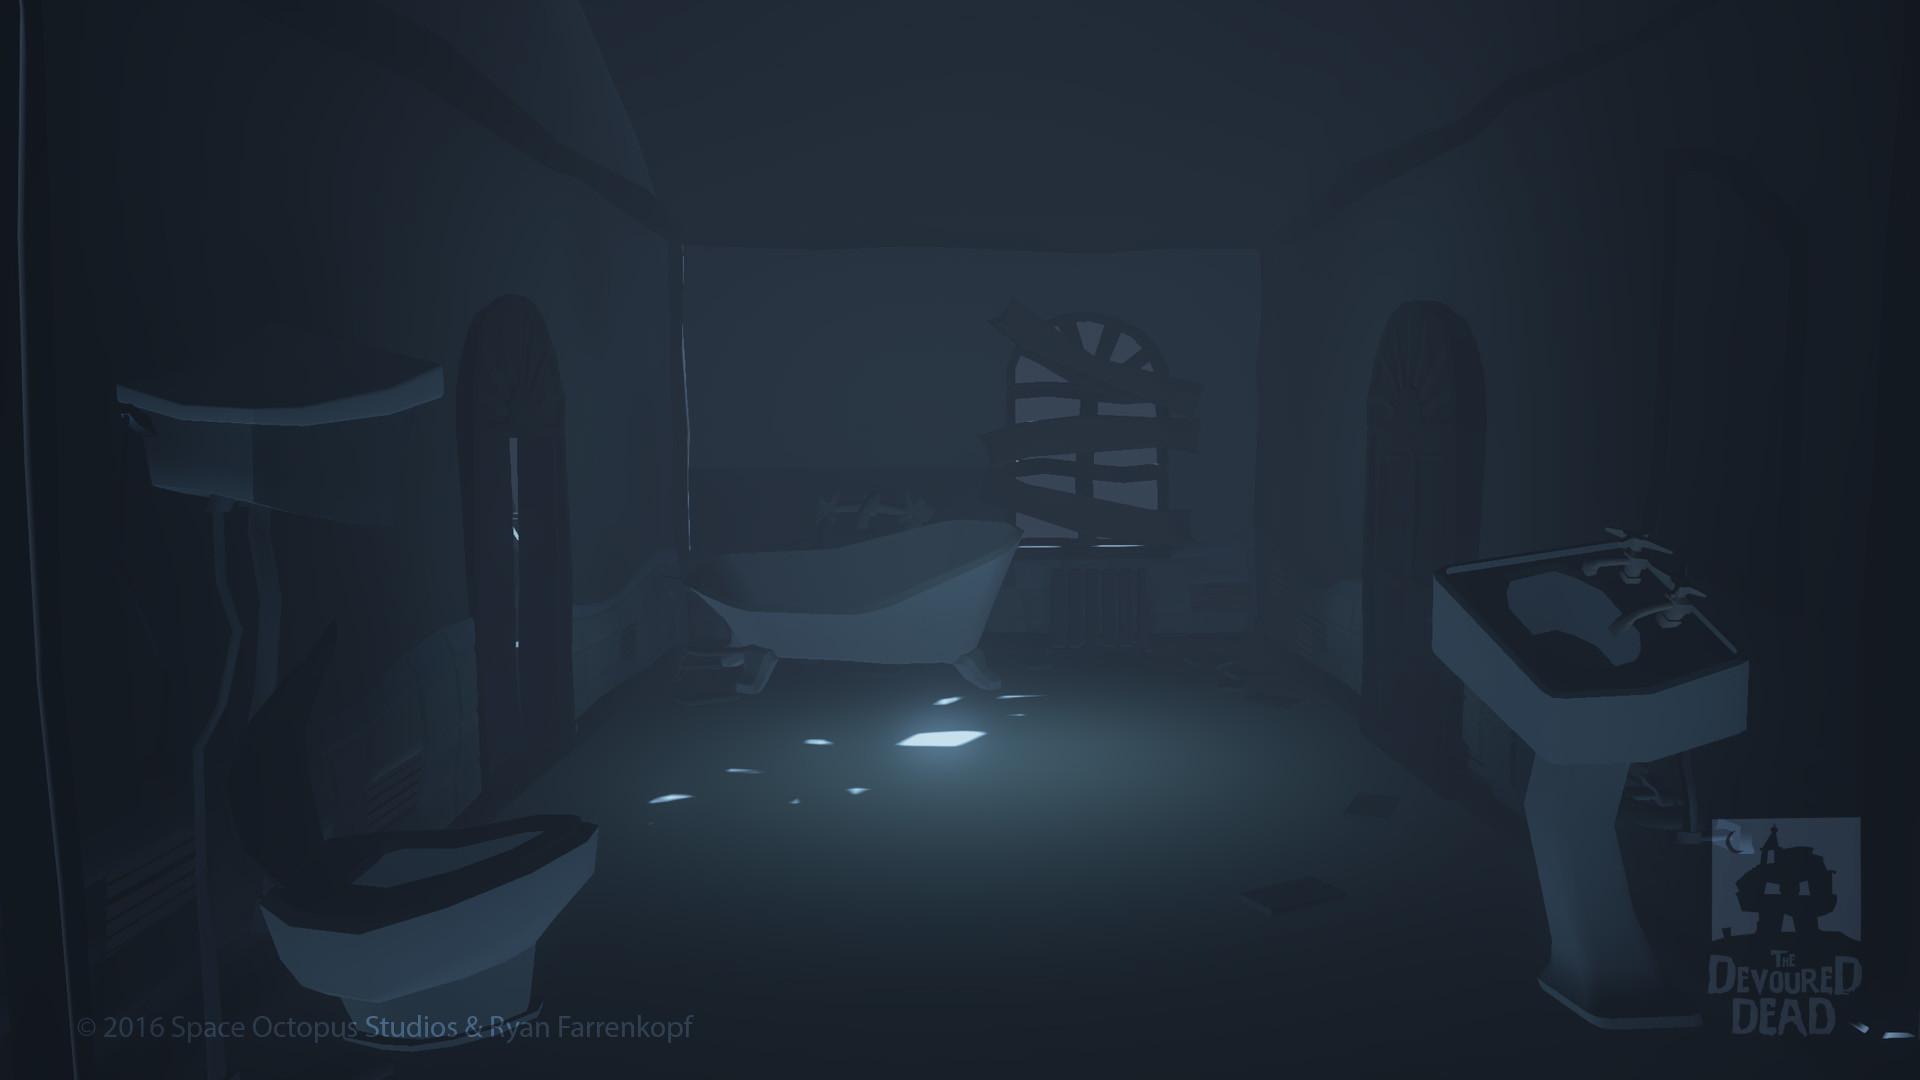 Ryan farrenkopf tdd bathroom 03